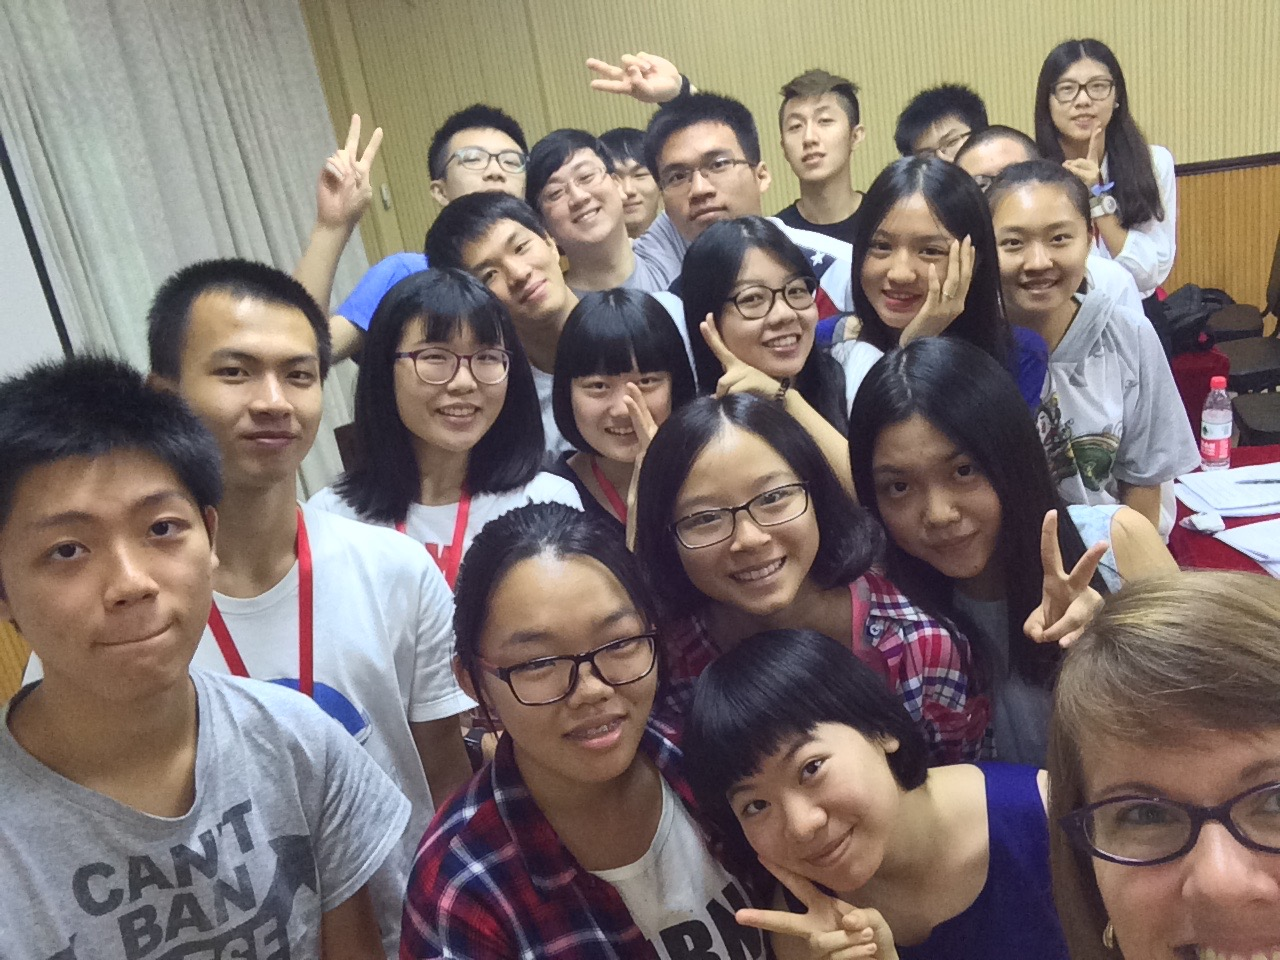 Guangzhou, China - session 2, leadership communications class